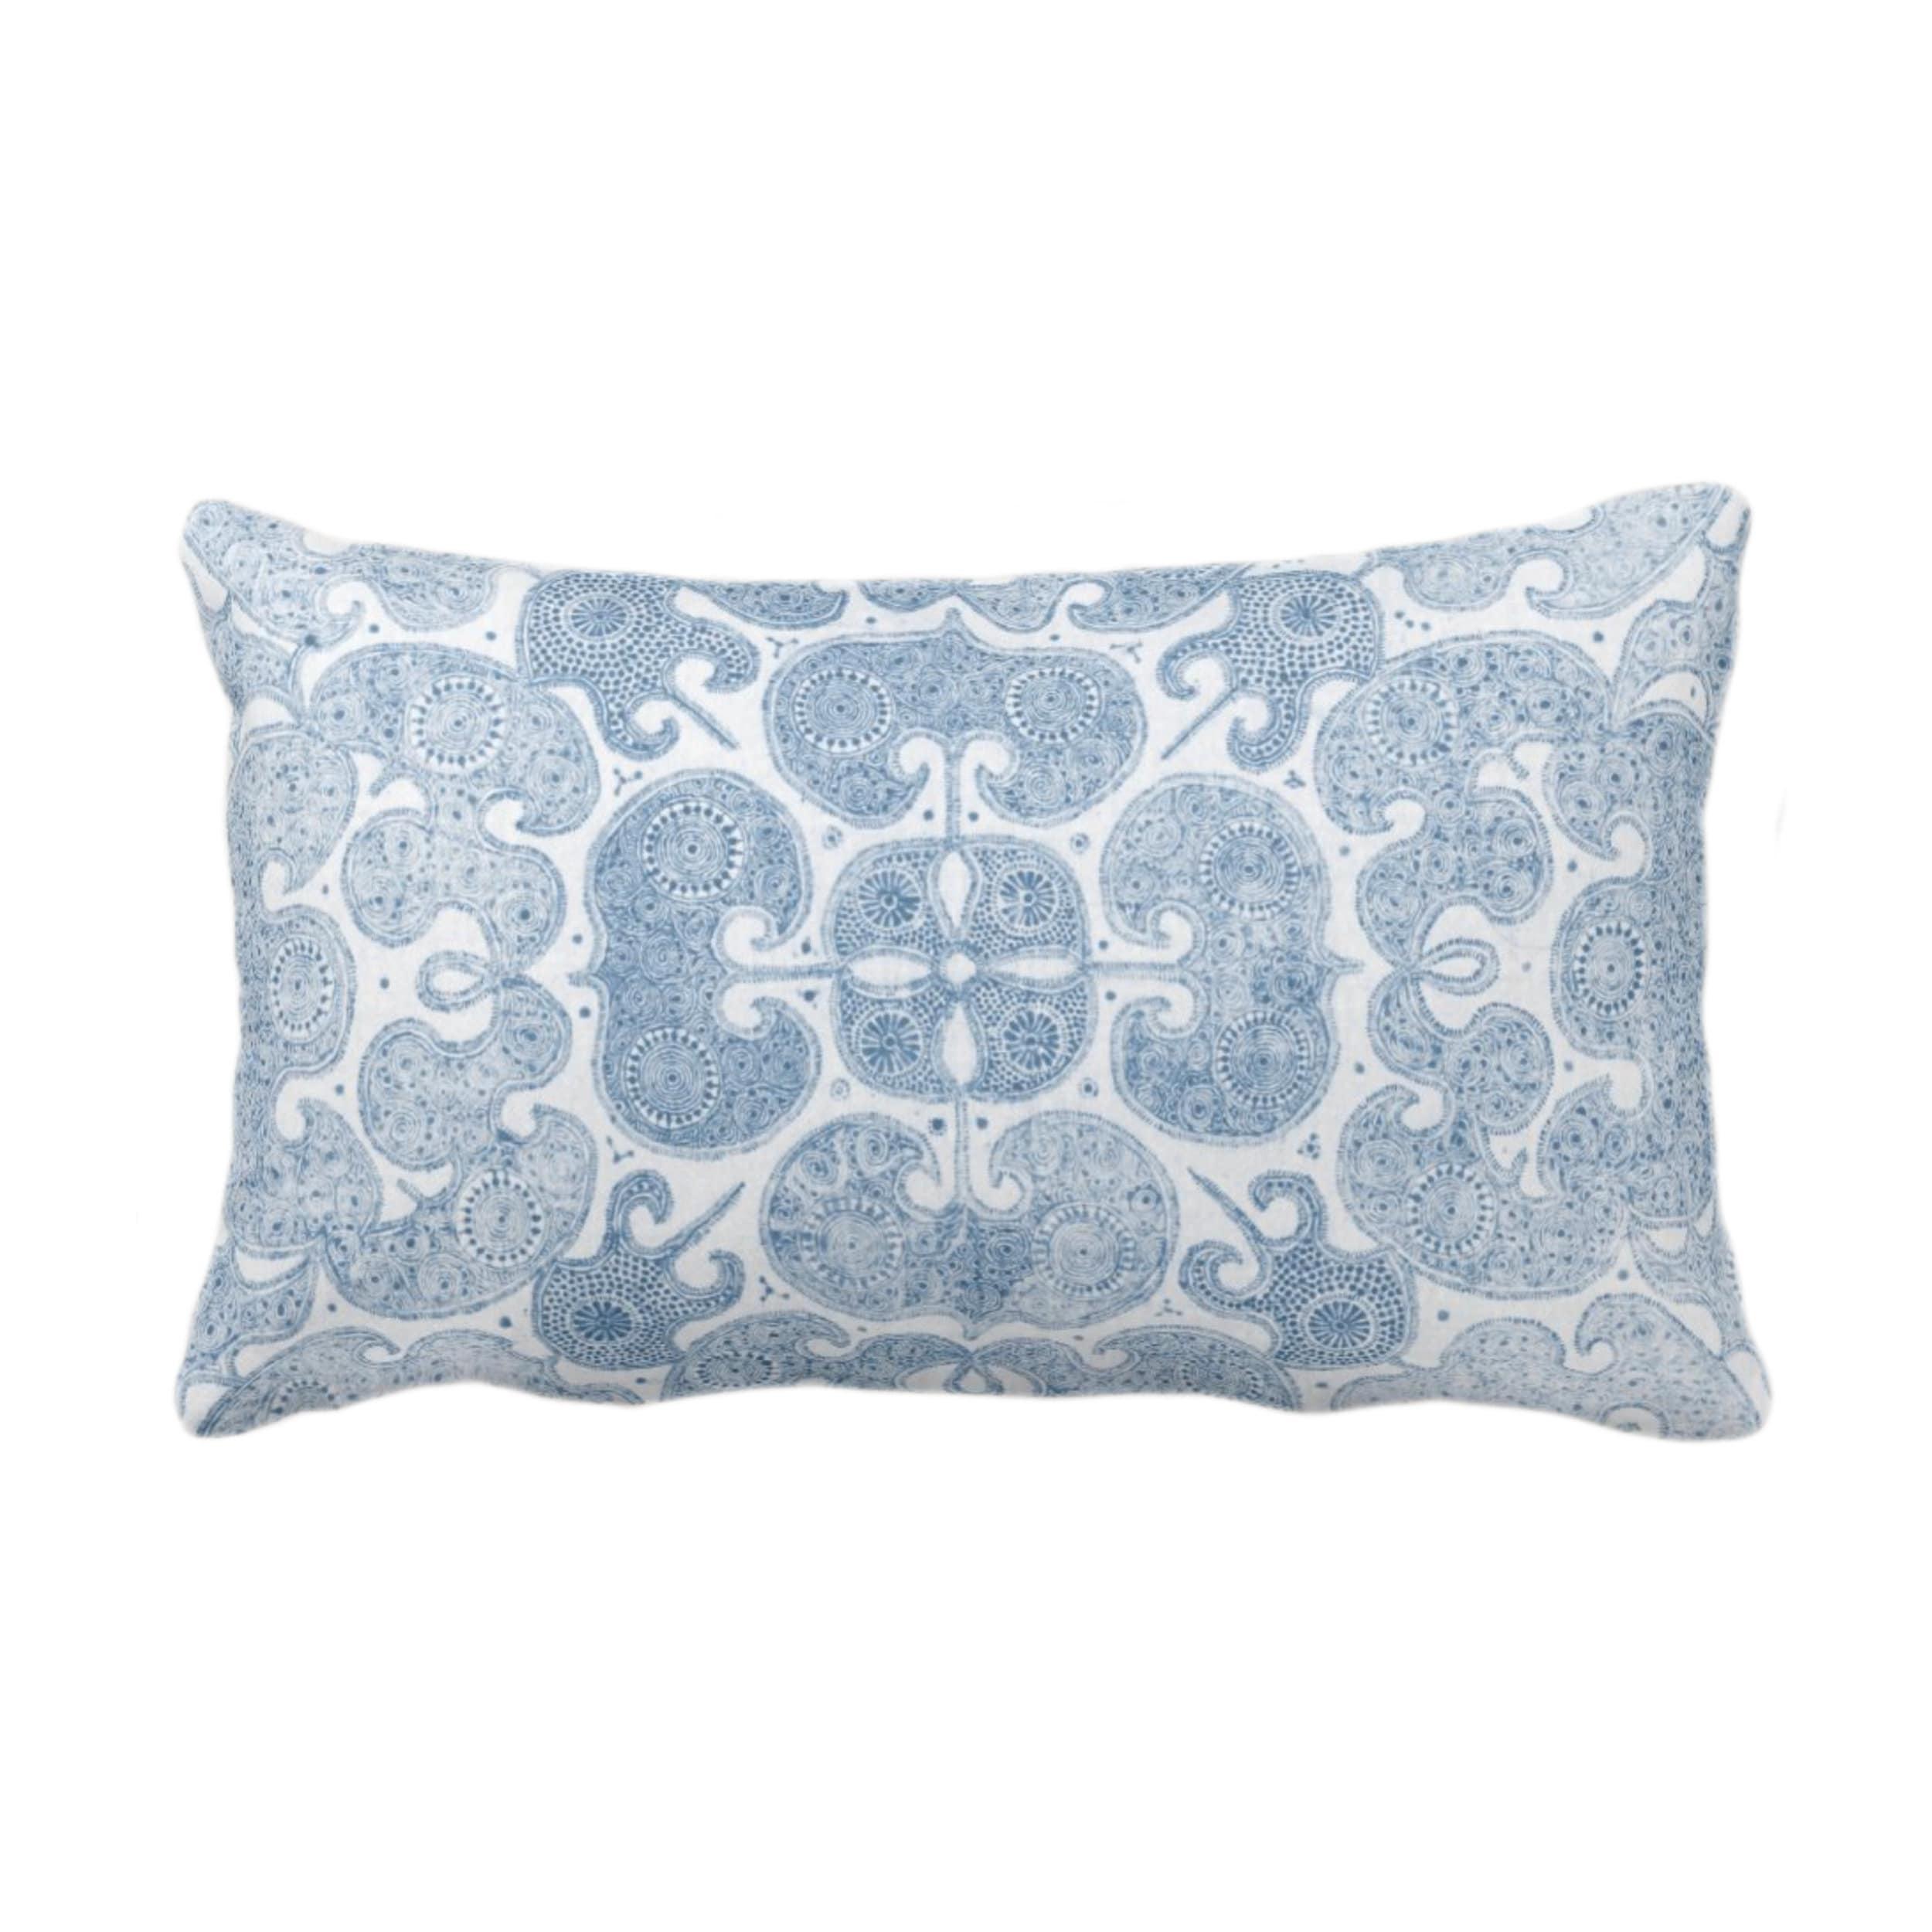 Outdoor Batik Print Throw Pillow Or Cover Washed Indigo 14 X 20 Lumbar Pillows Covers Light Blue Floral Geo Boho Tribal Hmong Pattern